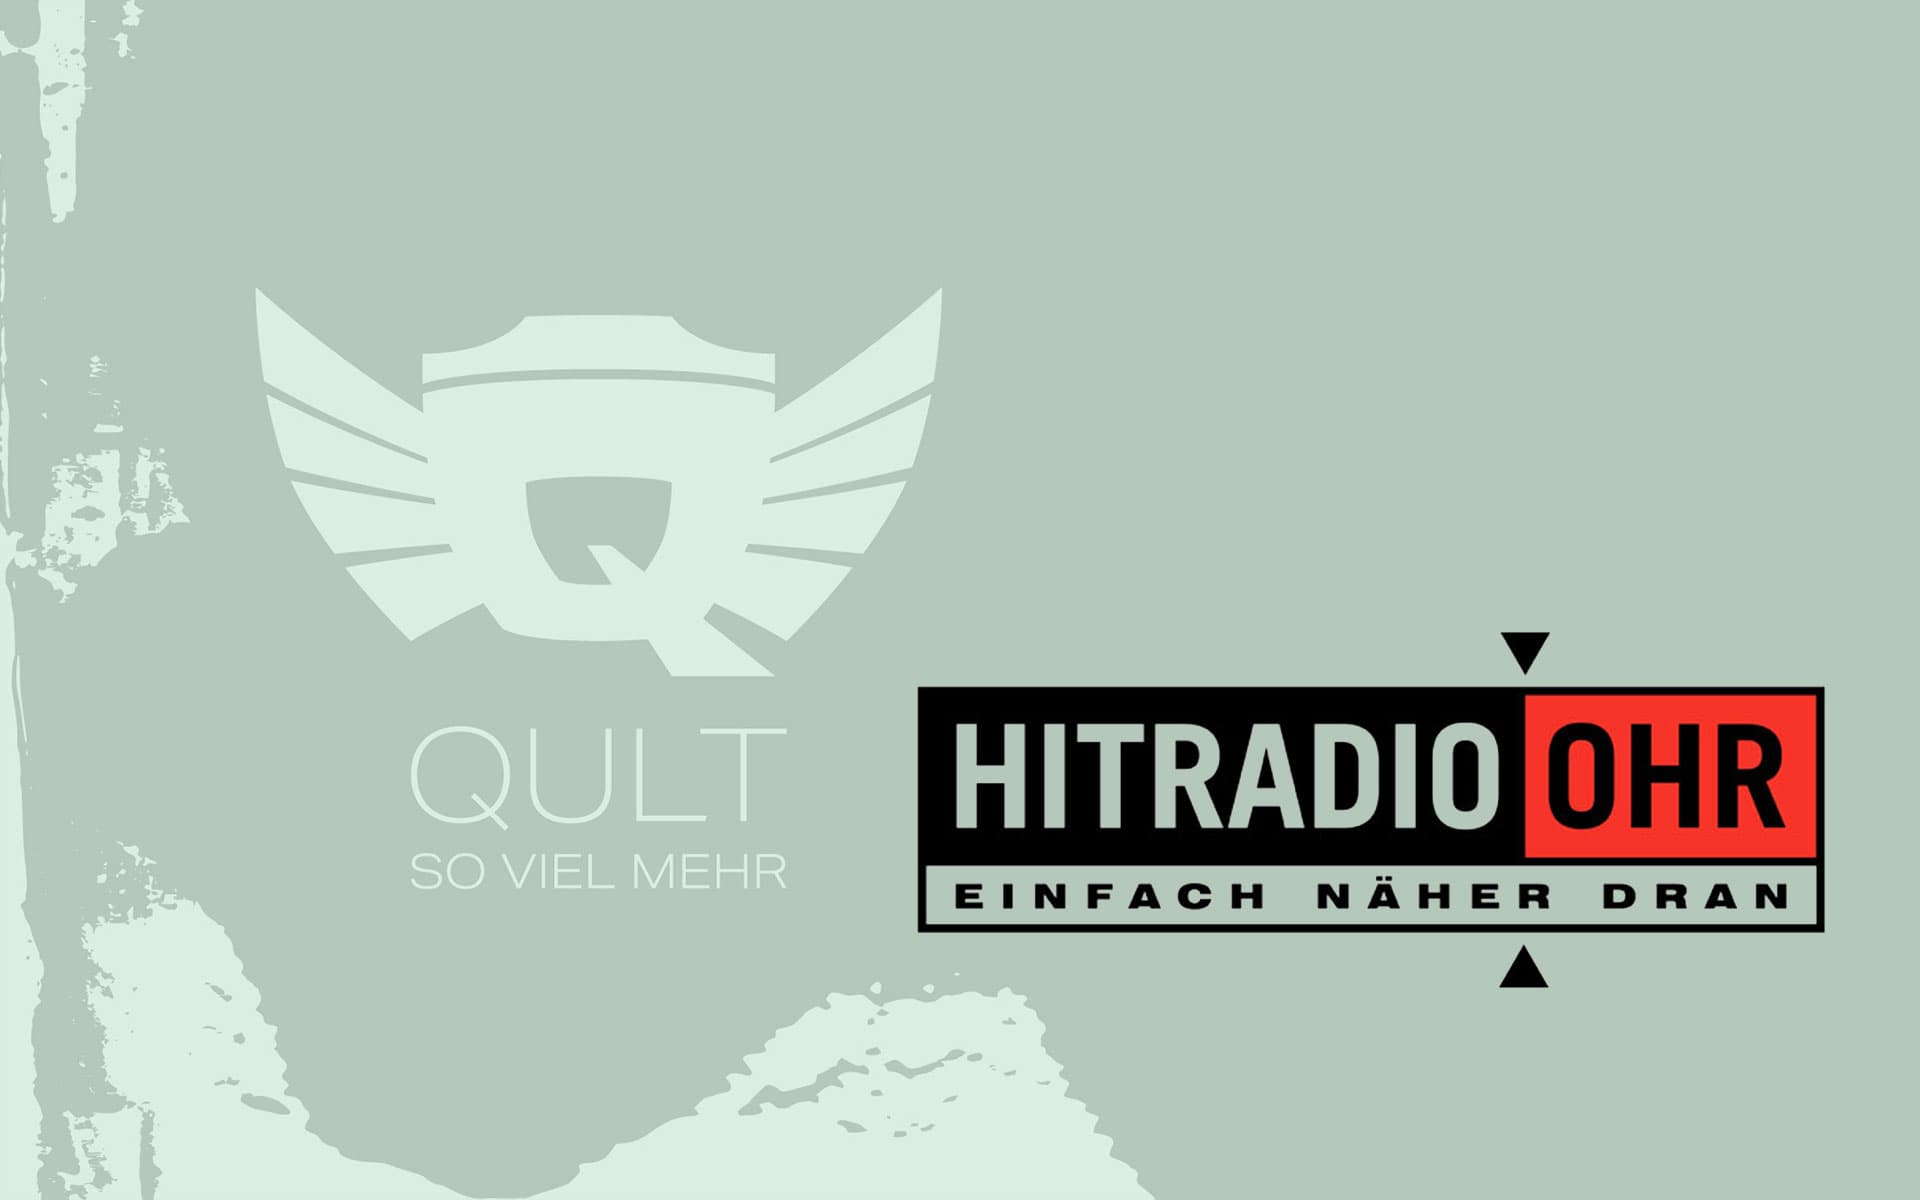 HITRADIO OHR QULT So viel mehr EP